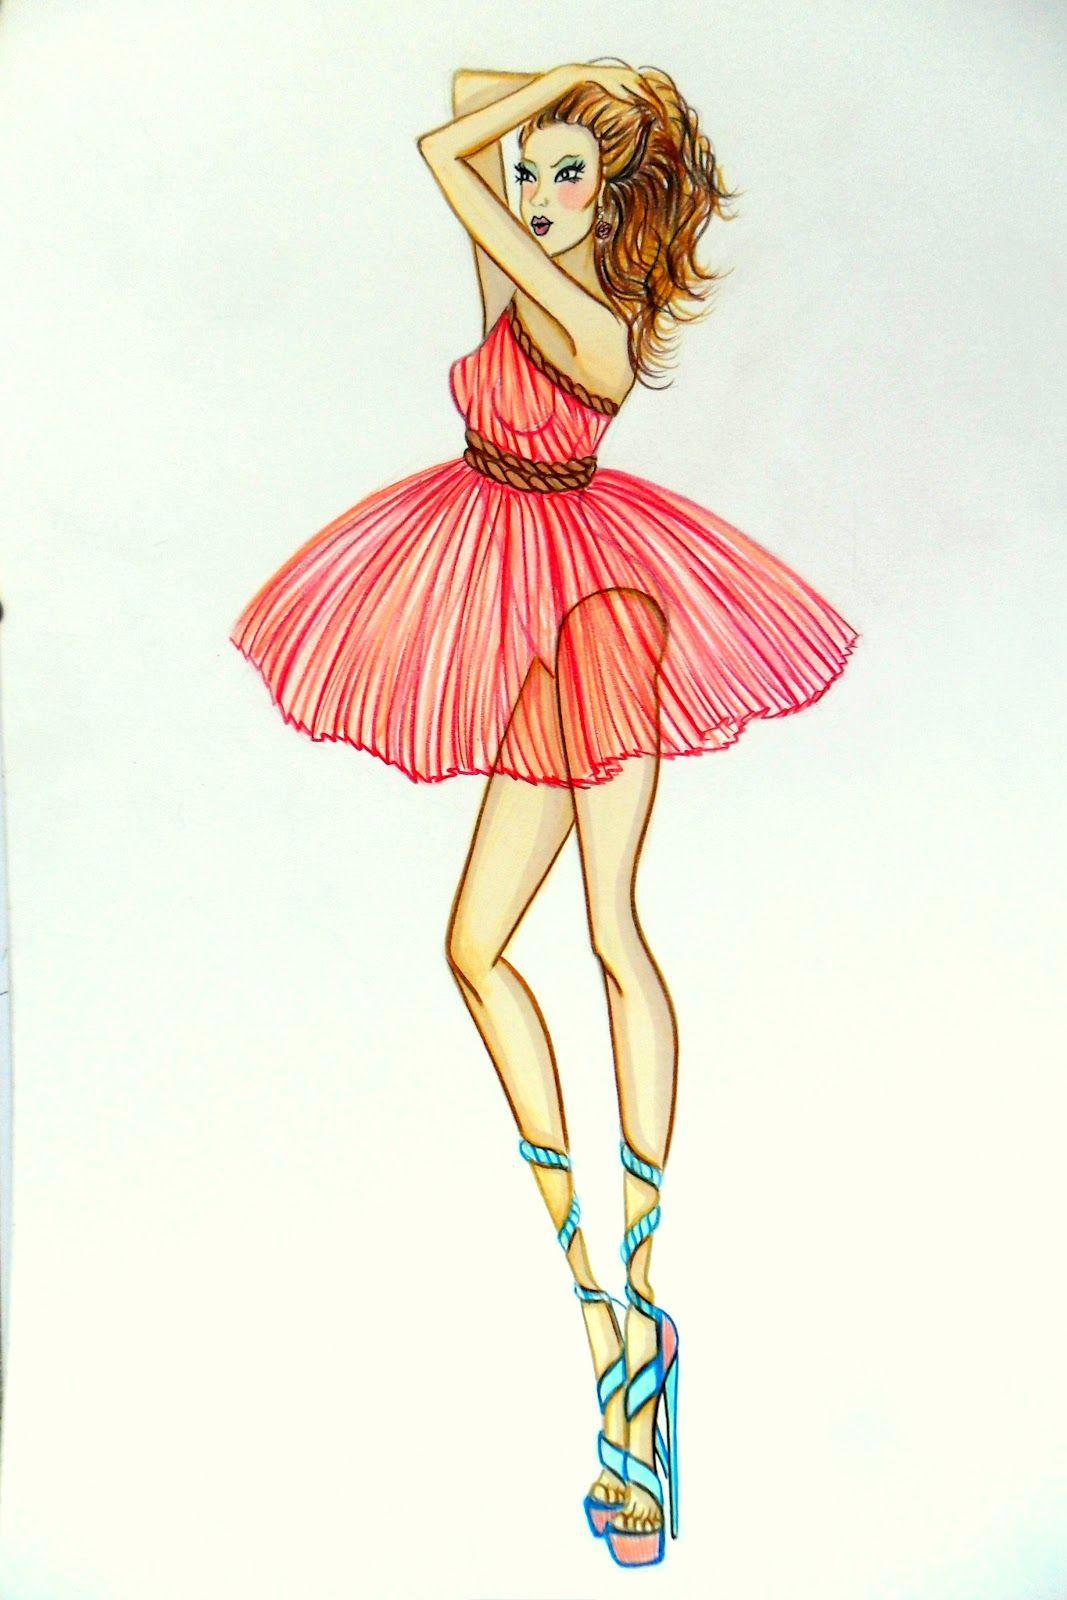 Short Dress Drawing : short, dress, drawing, Stellita, StaR:, COLLEZIONE, Primavera, Estate, Fashion, Sketches, Short, Dress, Shiffon, Plisse